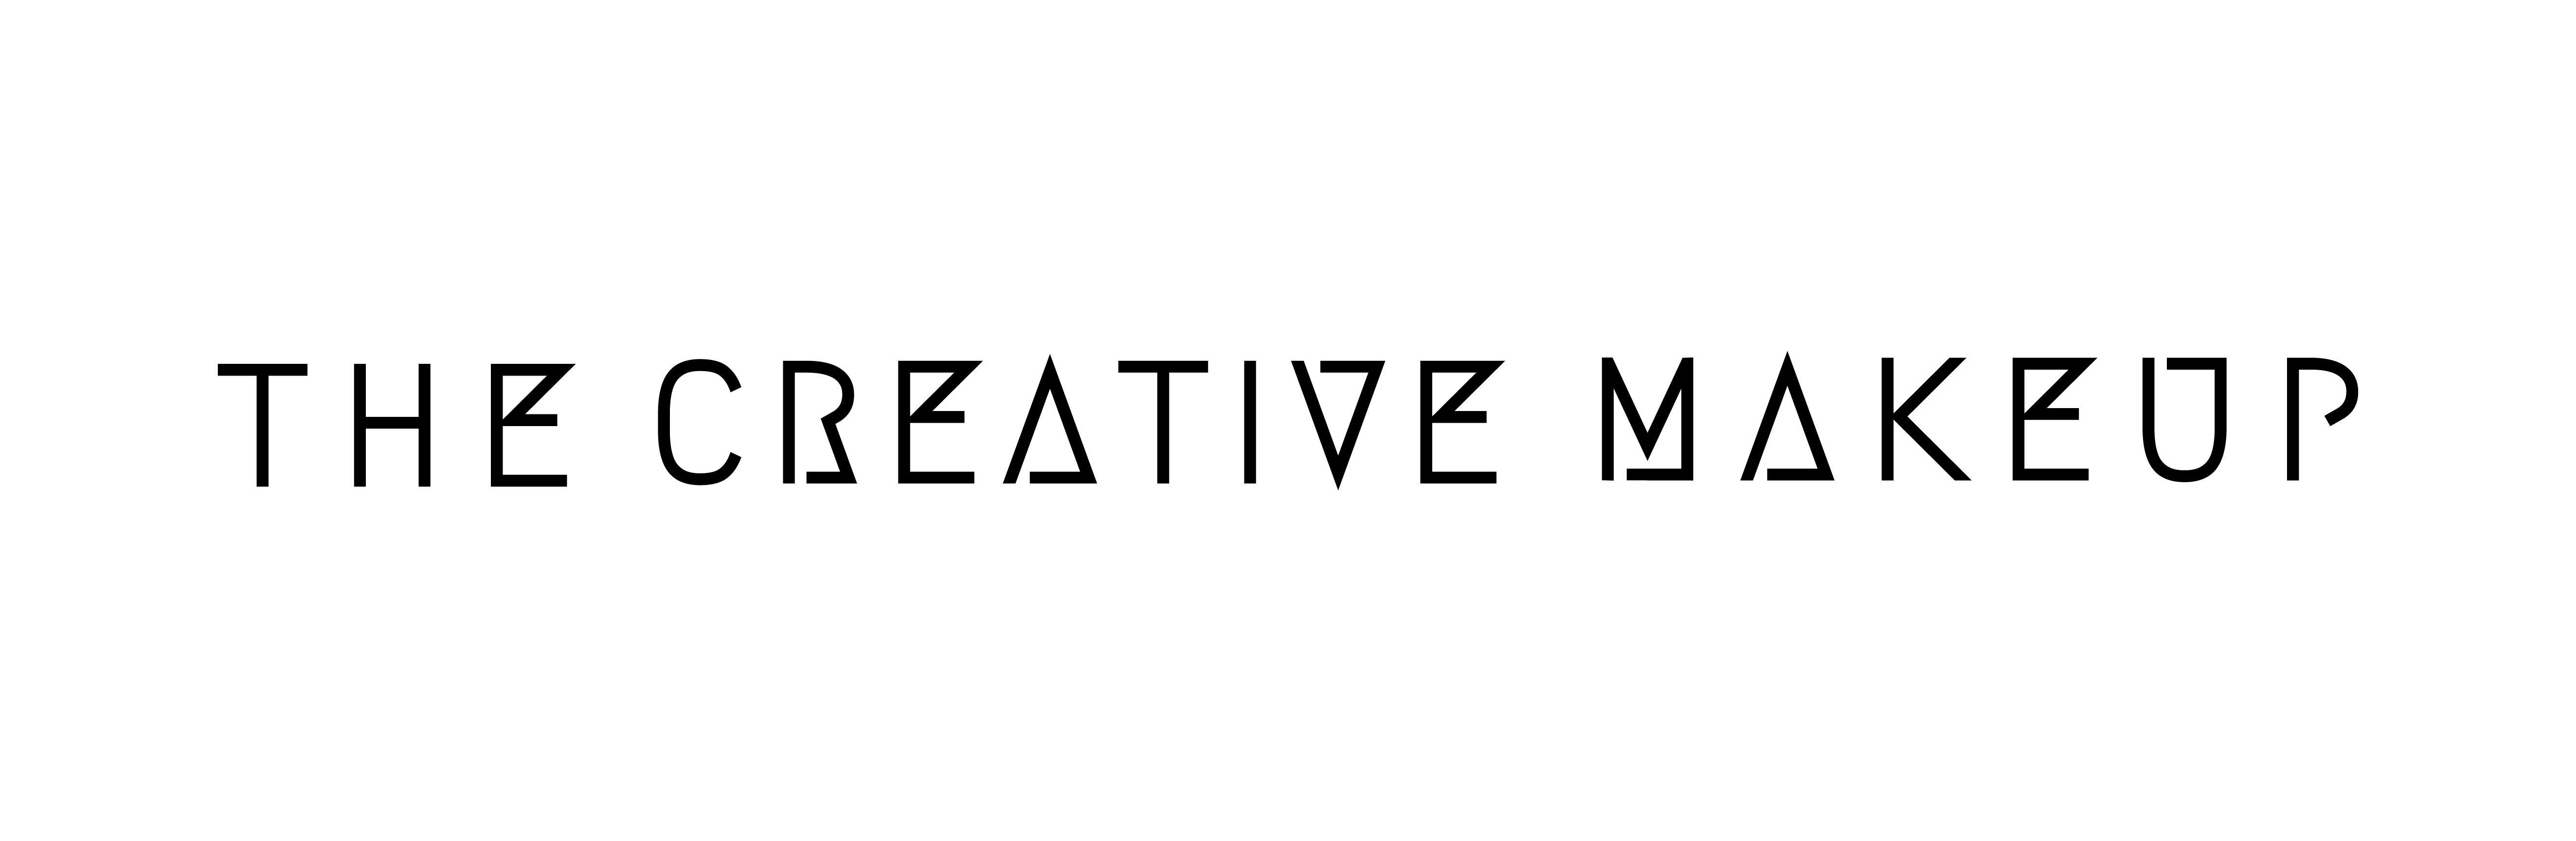 the_creative_makeup.jpg